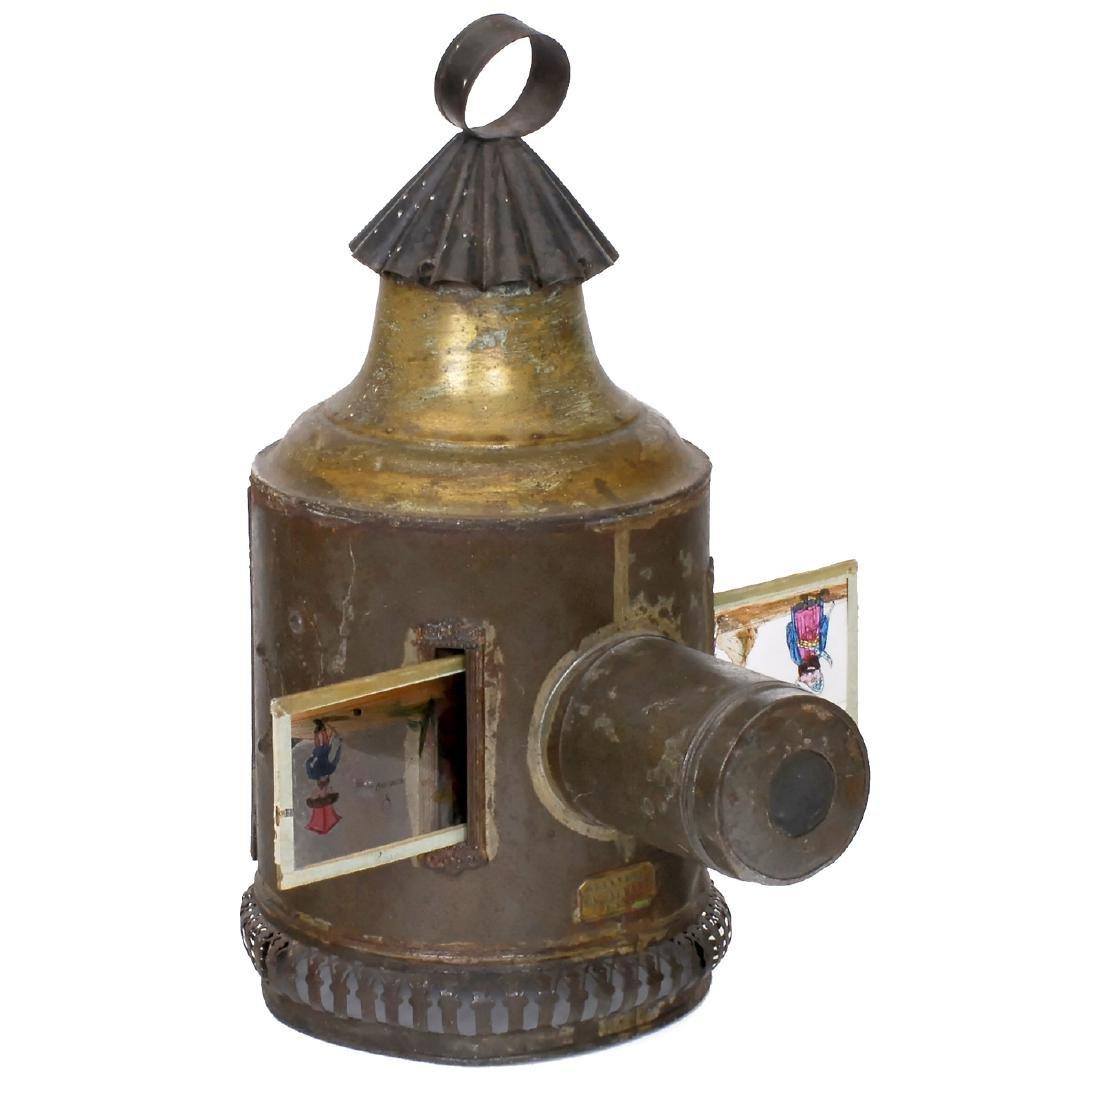 Rare Round Brass Magic Lantern by Aubert, c. 1880